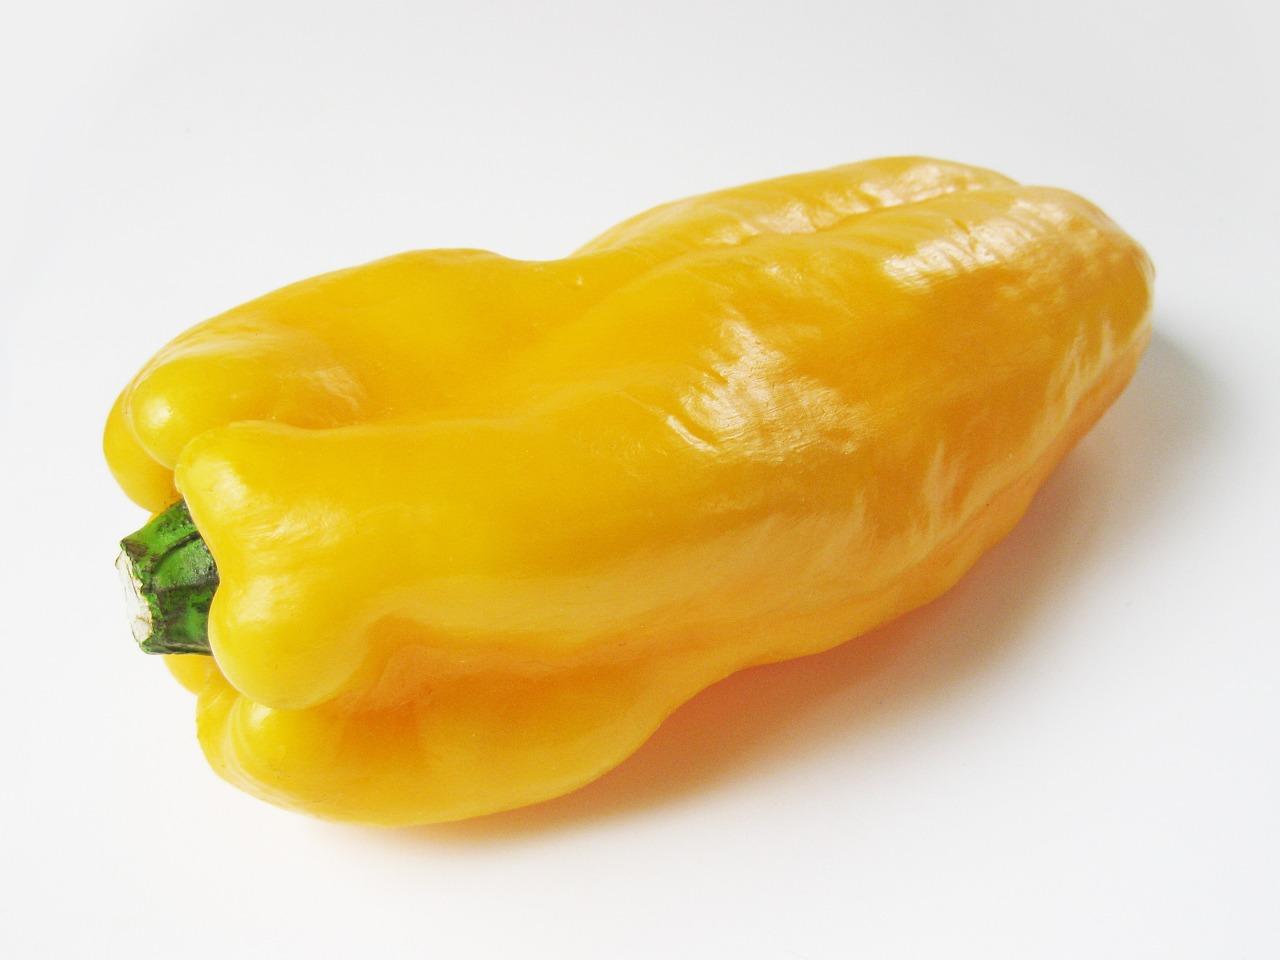 Free Images : white, fruit, food, produce, vegetable, yellow, back ...